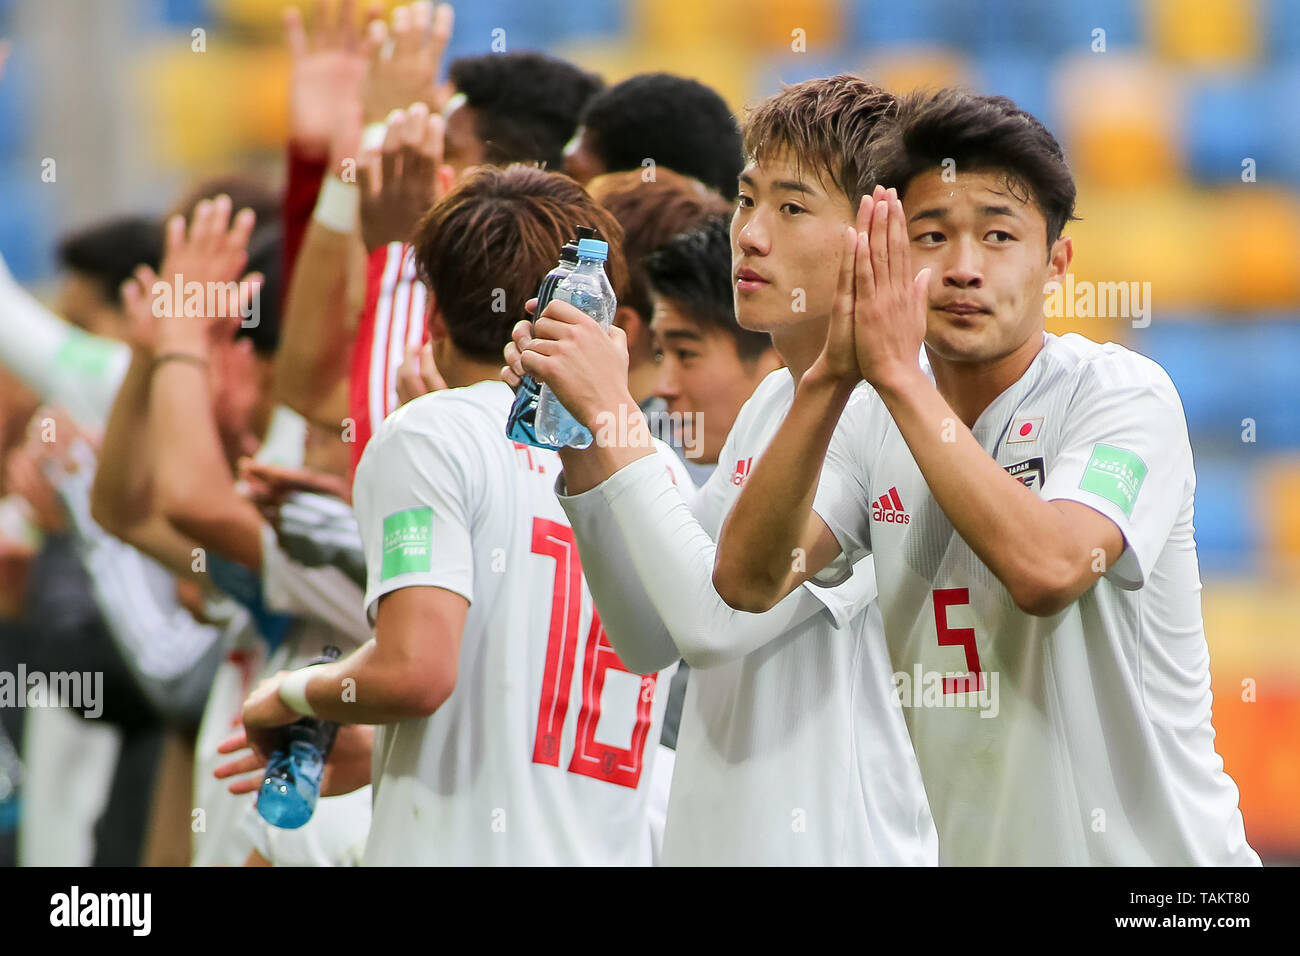 Gdynia Stadium, Gdynia, Poland - 26th May, 2019: Yukinari Sugawara, Ayumu Seko from Japan are seen thanking after  FIFA U-20 World Cup match between Mexico and Japan (GROUP B) in Gdynia. (Final score; Mexico 0:3 Japan) - Stock Image